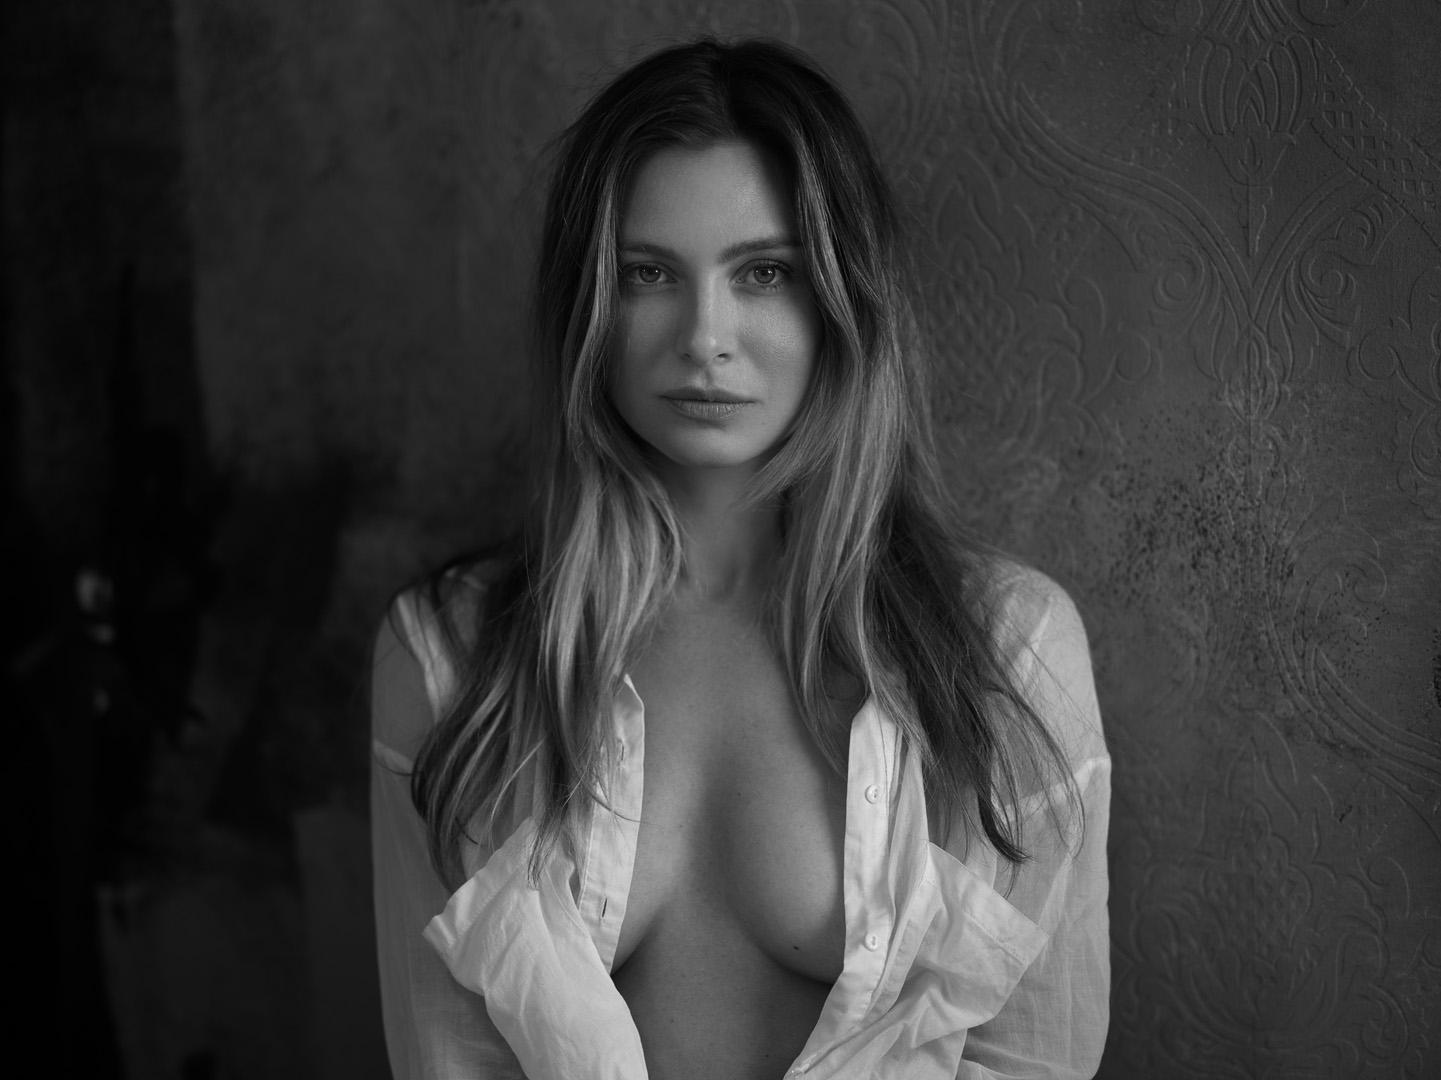 Julia21-02_100060